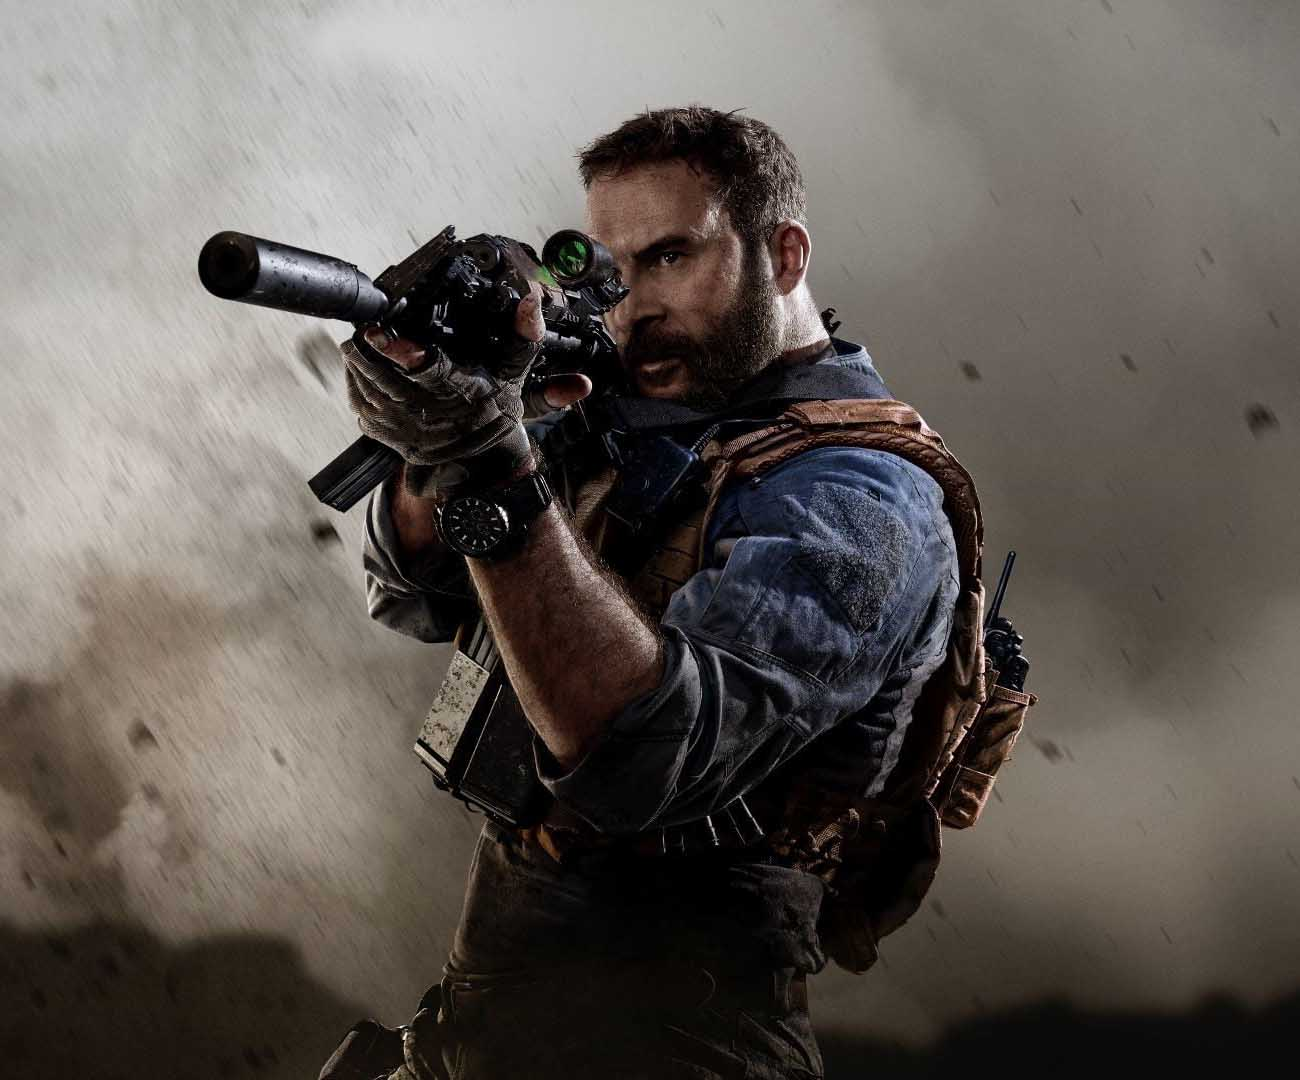 call of duty warzone, call of duty multiplayer, modern warfare